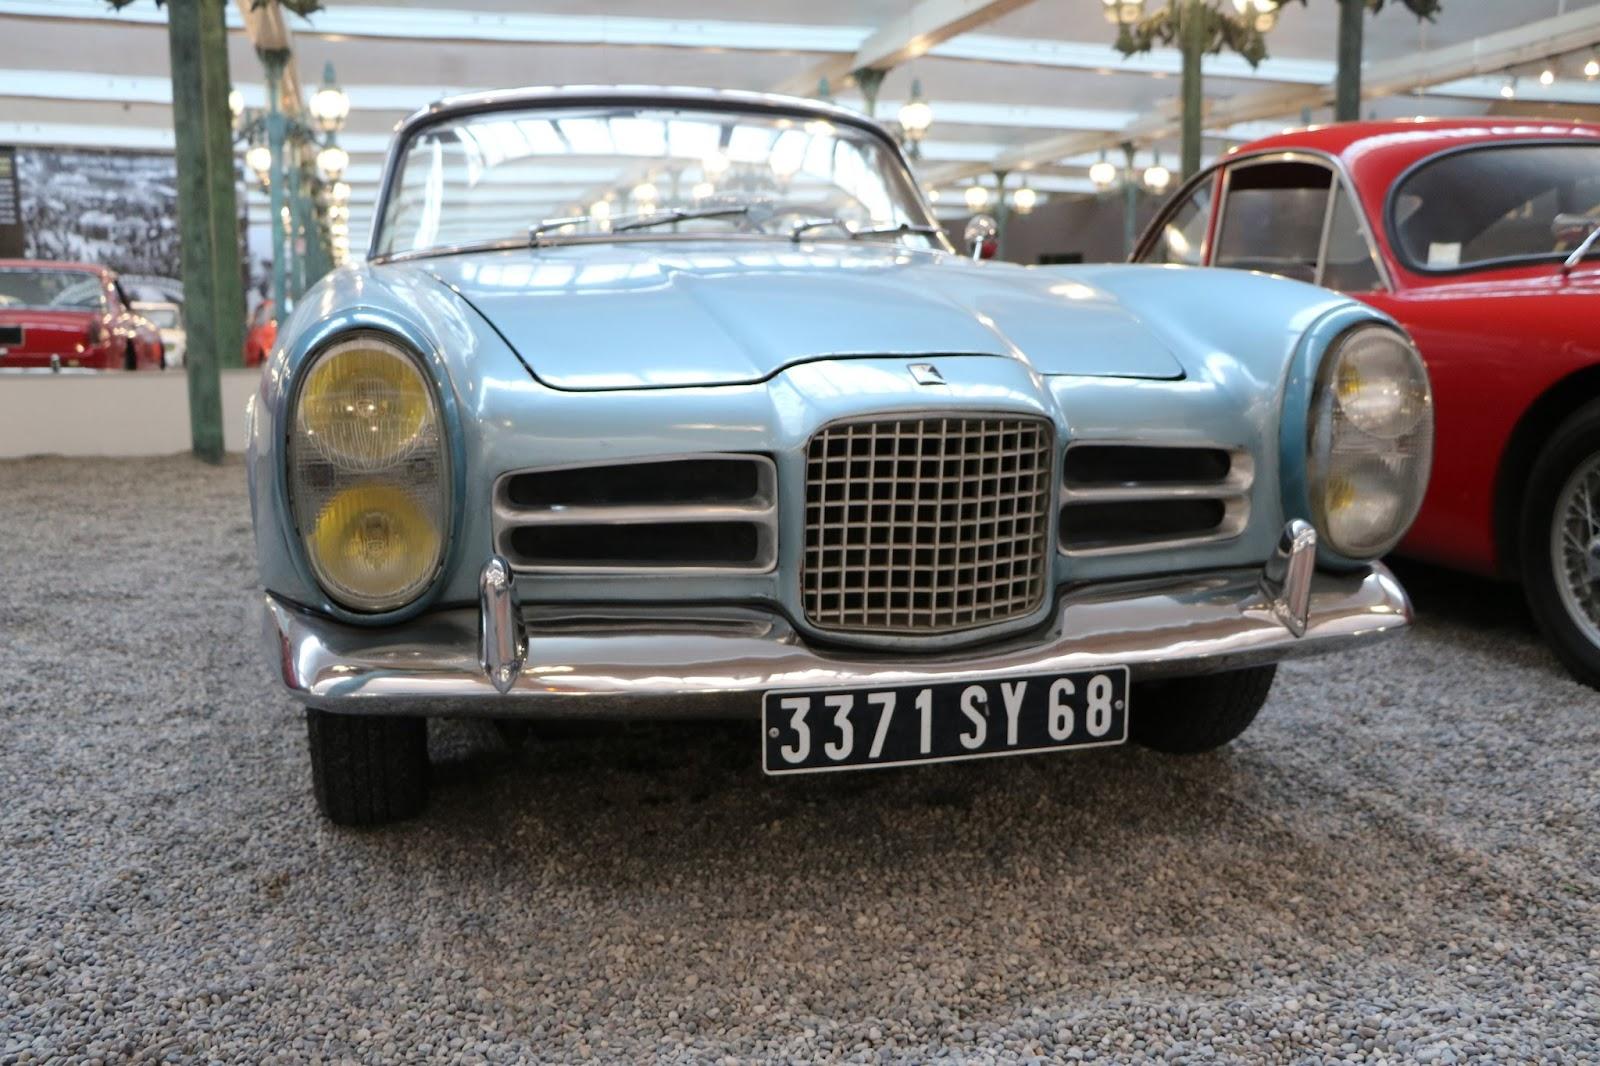 Schlumpf Collection 0966 - 1963 Facel Vega Cabriolet Type Facel III.jpg